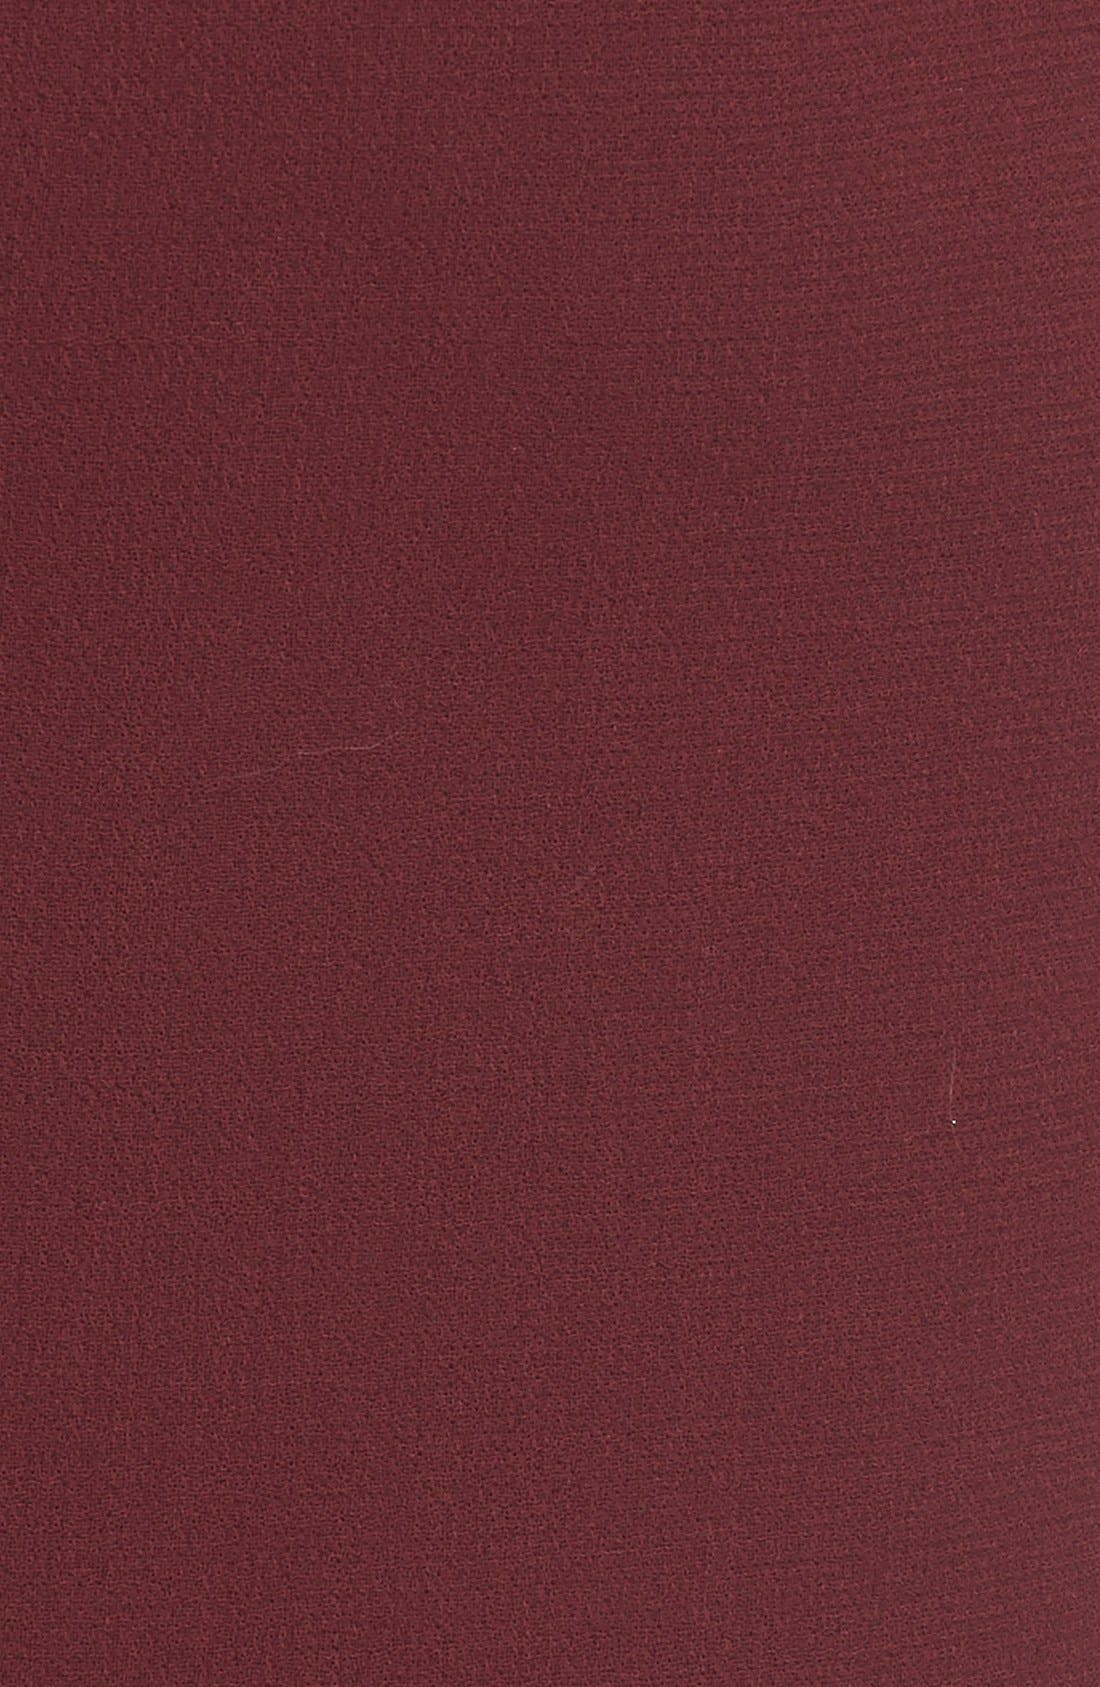 Alternate Image 3  - Erdem 'Joss' Wool Crepe Asymmetric Ruffle Hem Skirt